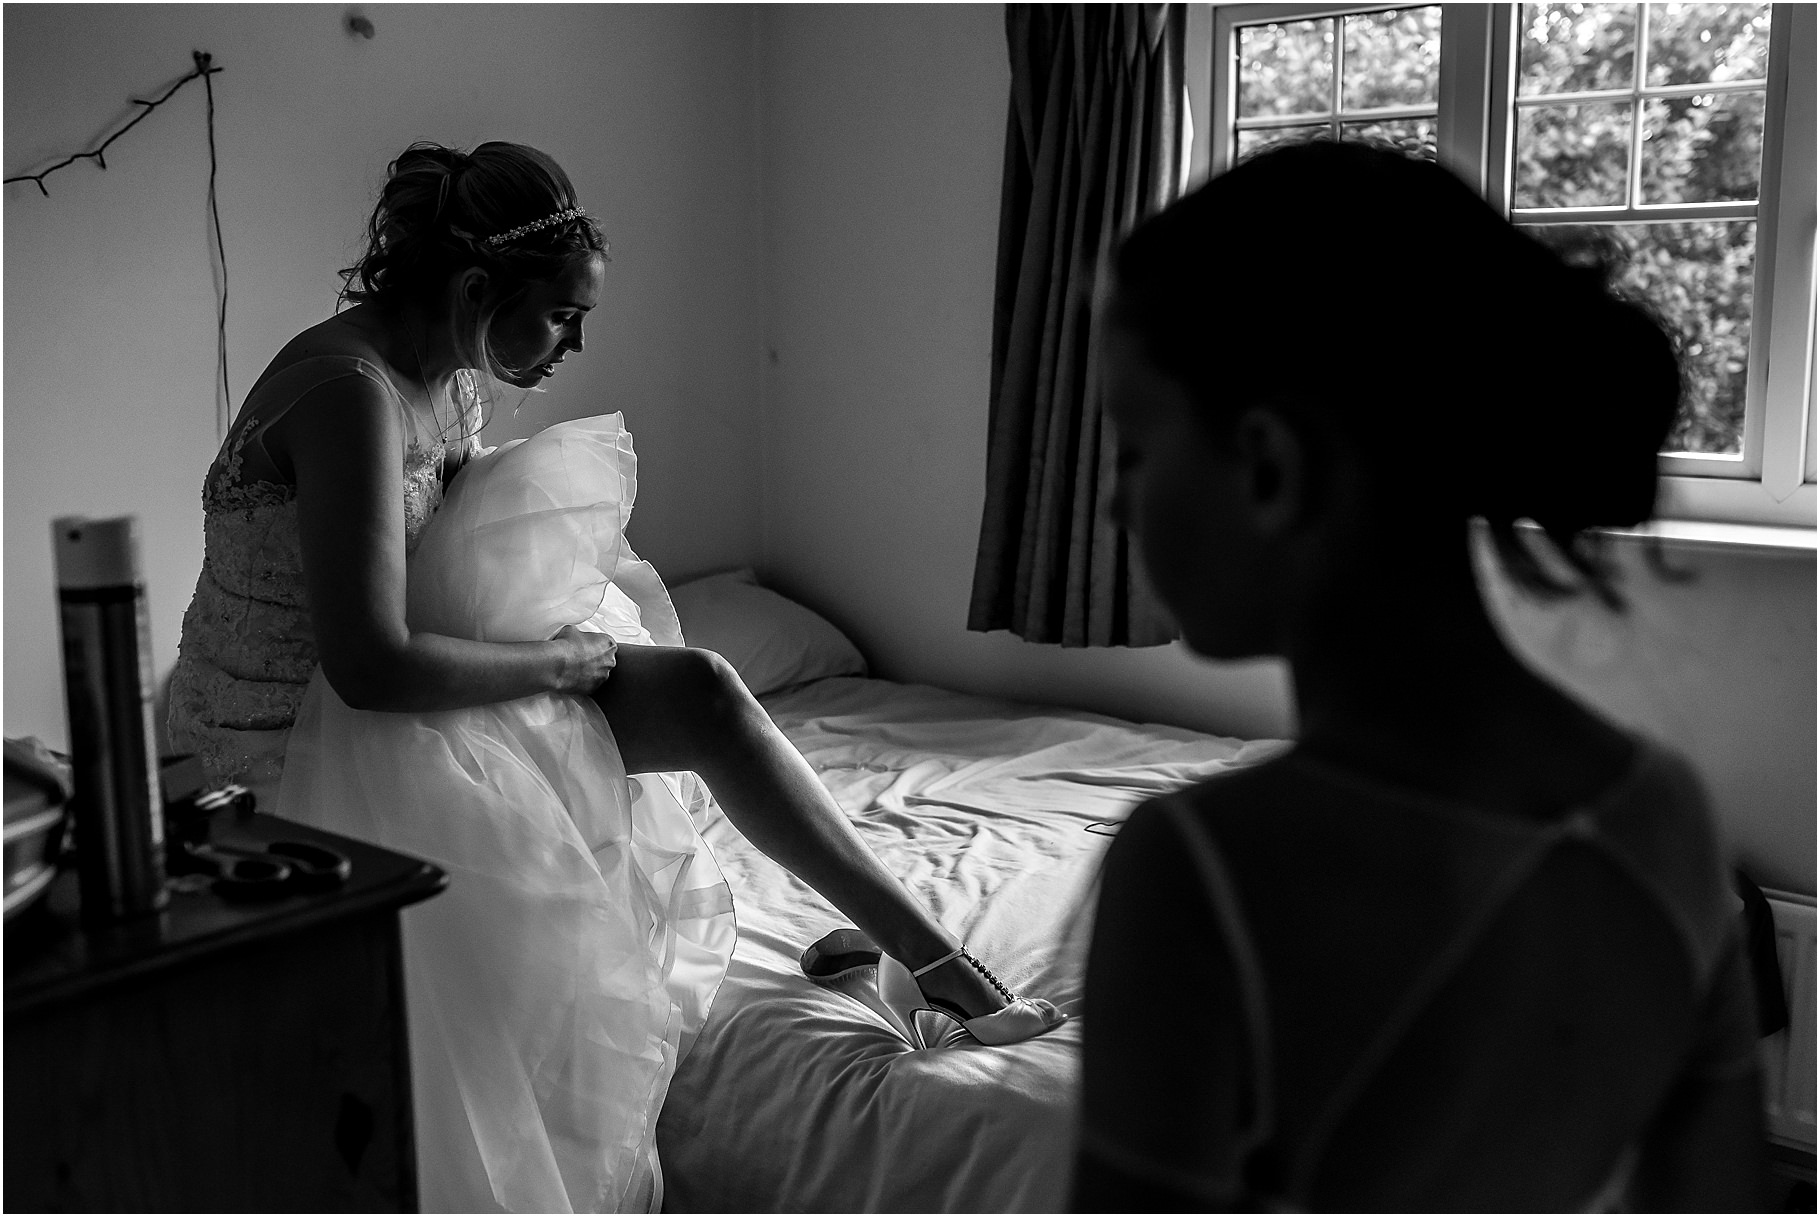 dan-wootton-photography-2017-weddings-154.jpg